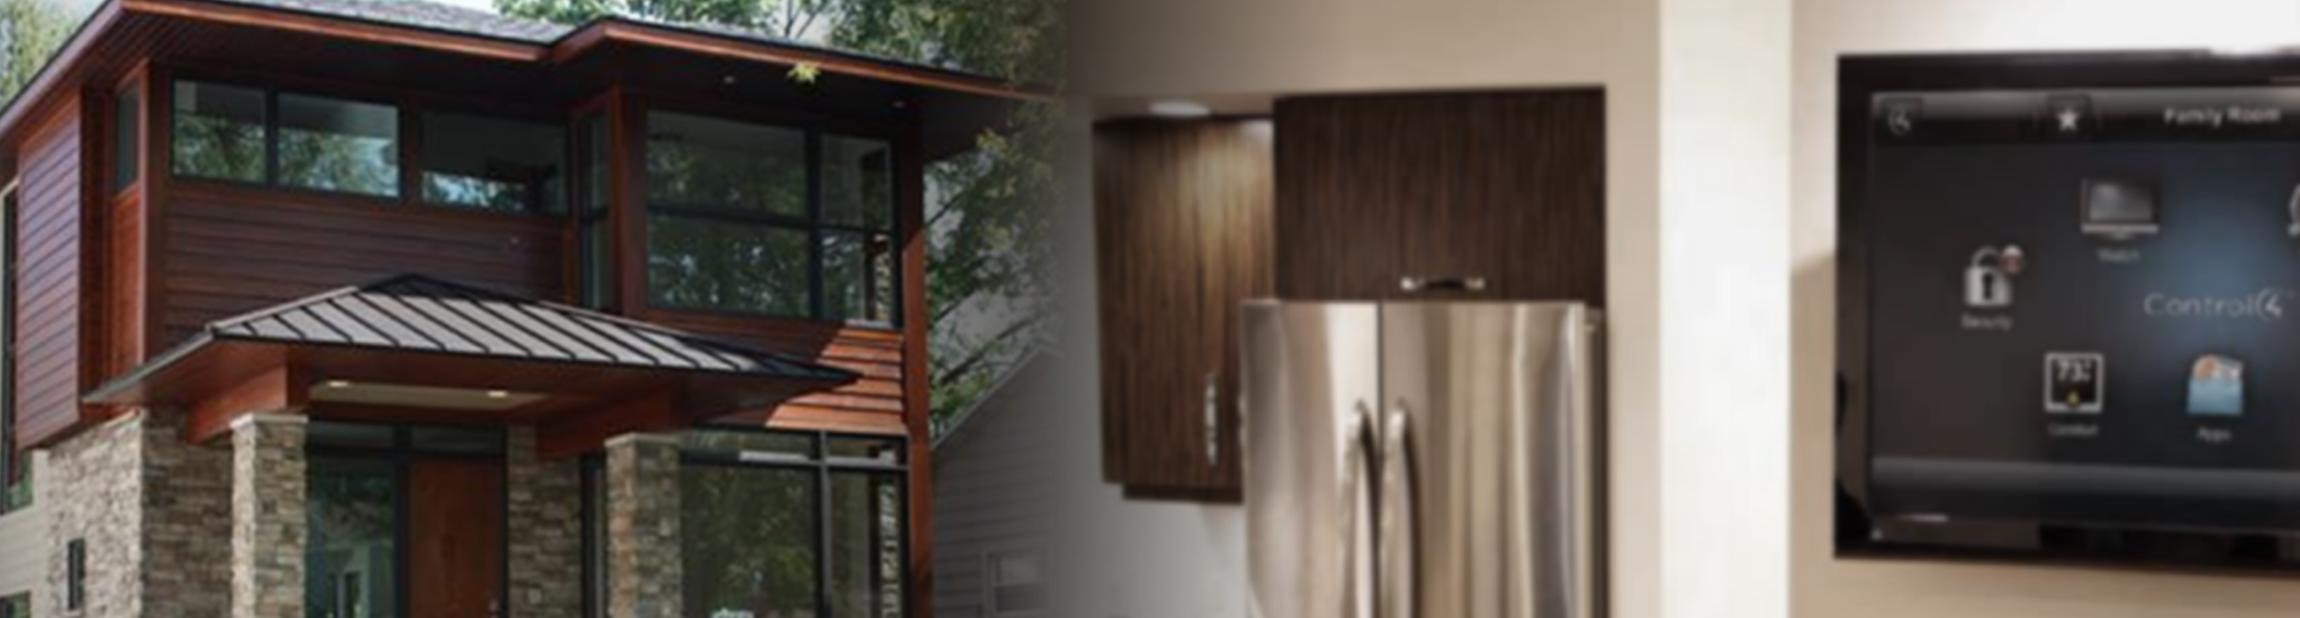 Birmingham-model-homes-5